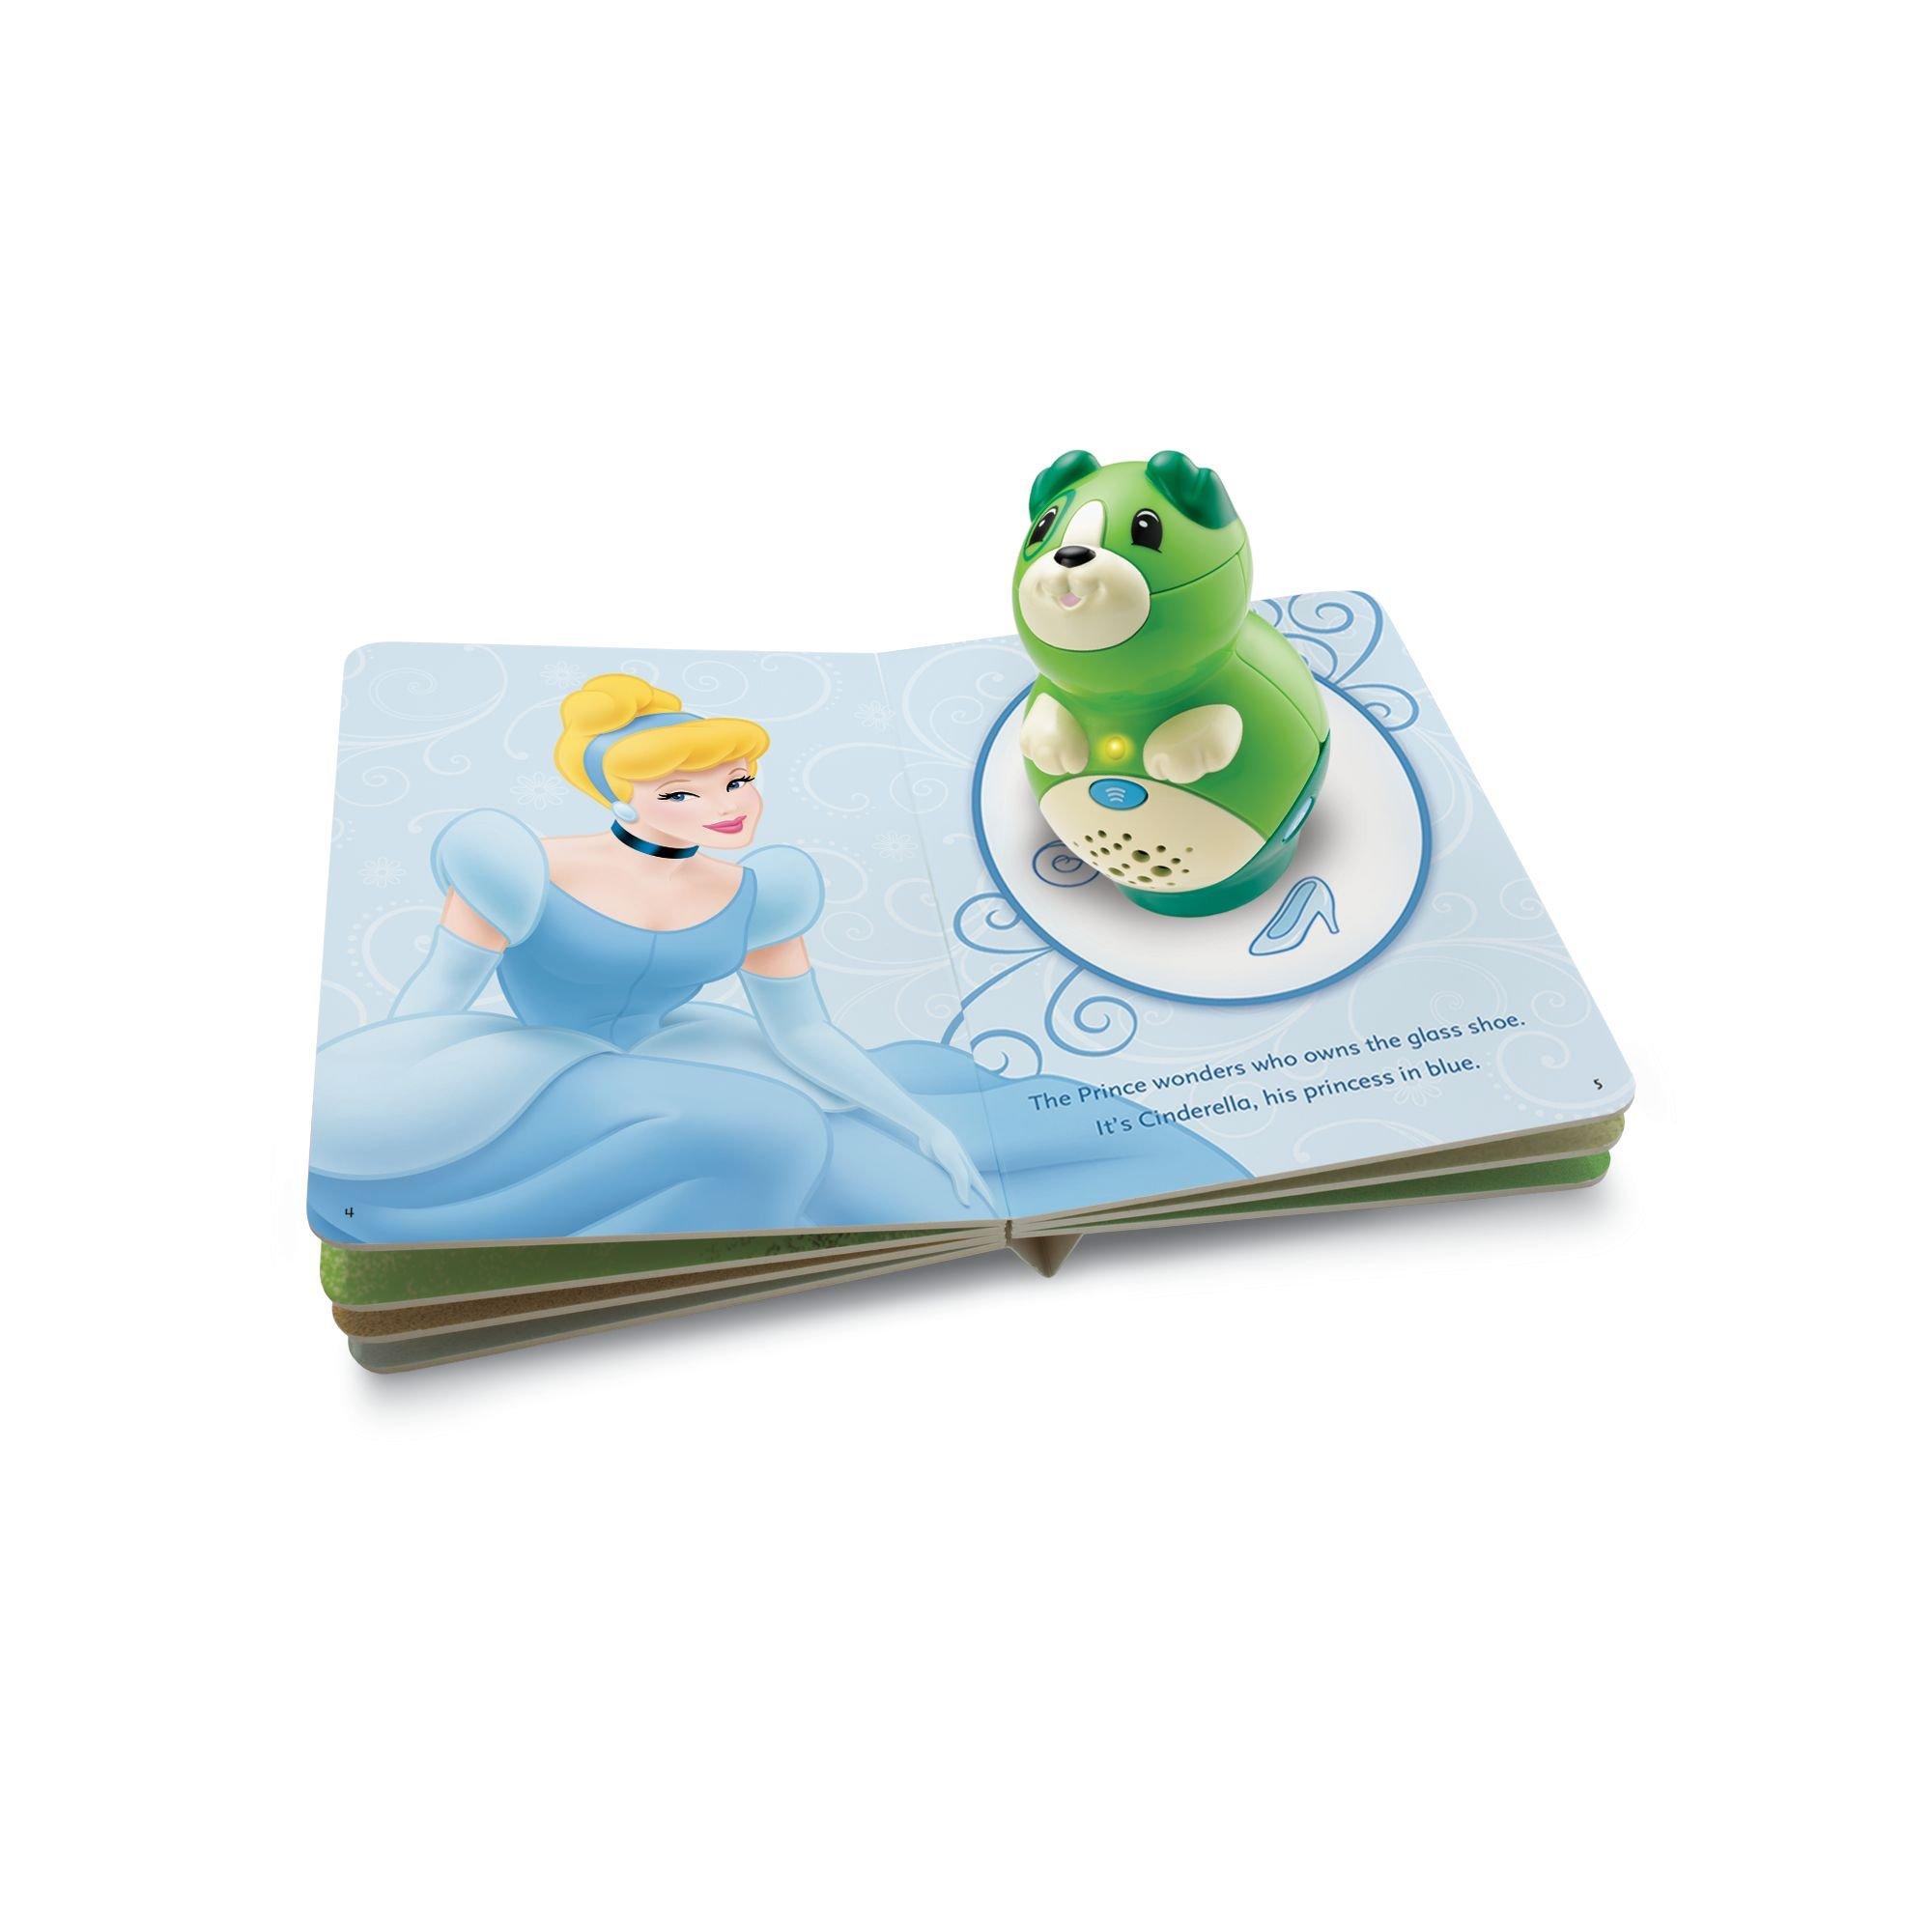 LeapFrog LeapReader Junior Book: Disney Princess: A Heart Full Love (works Tag Junior) by LeapFrog (Image #2)